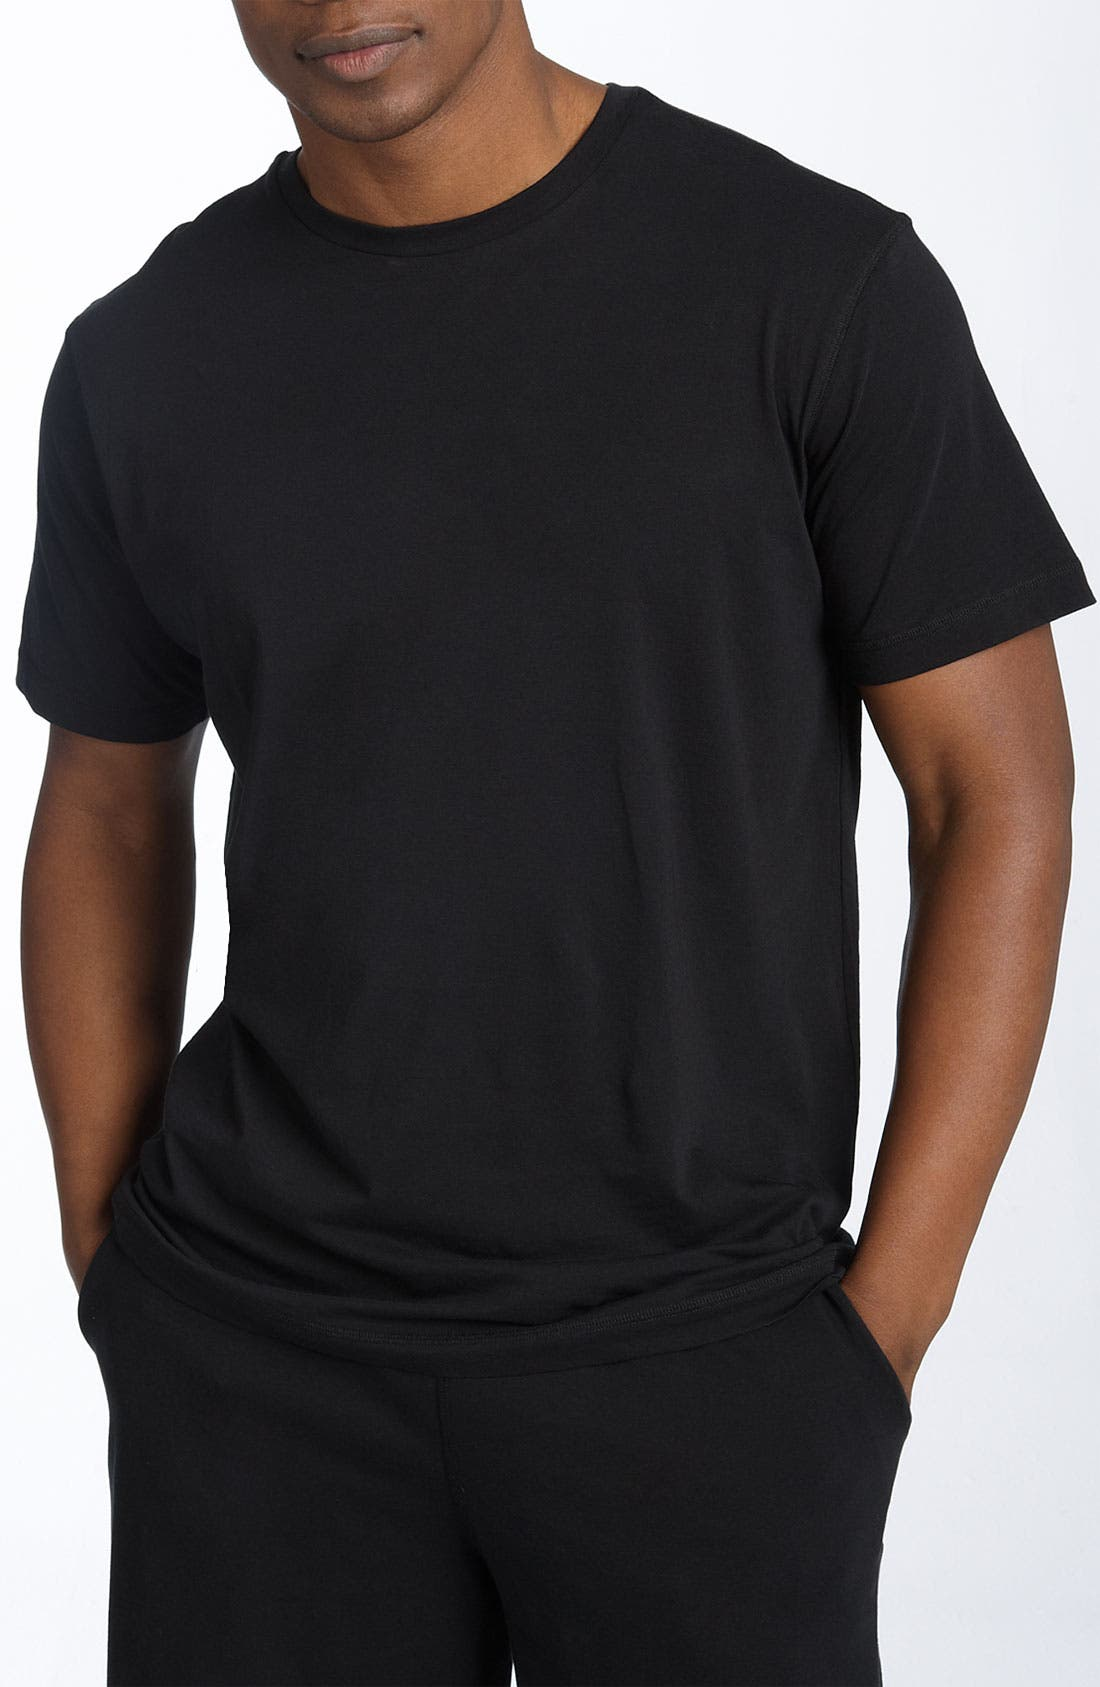 Peruvian Pima Cotton T-Shirt,                         Main,                         color, Black